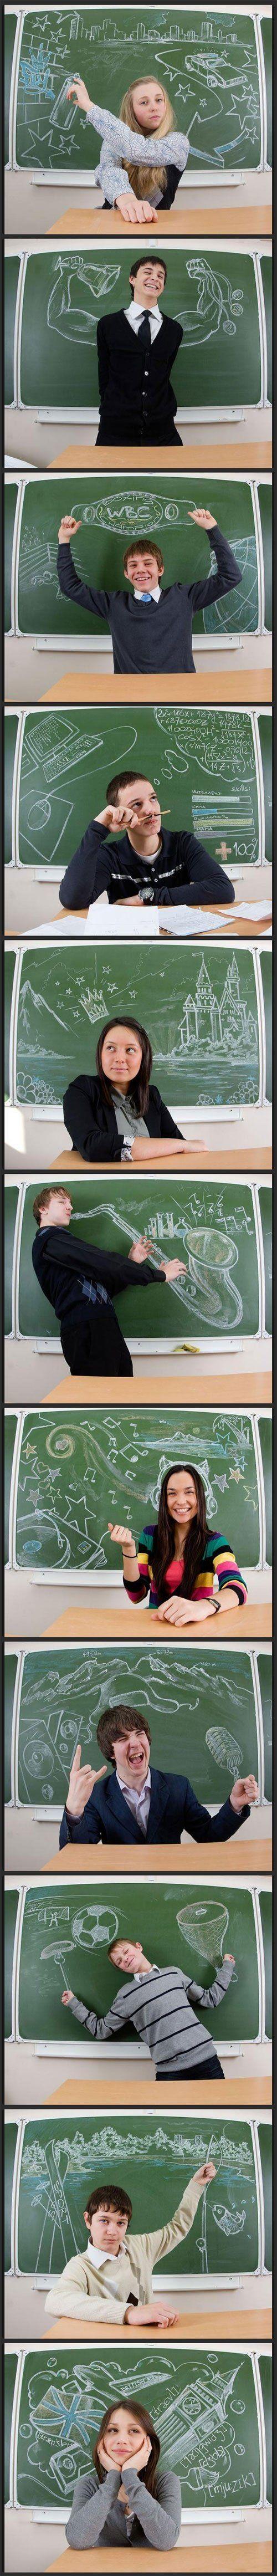 Creative class pictures art club craft ideas pinterest